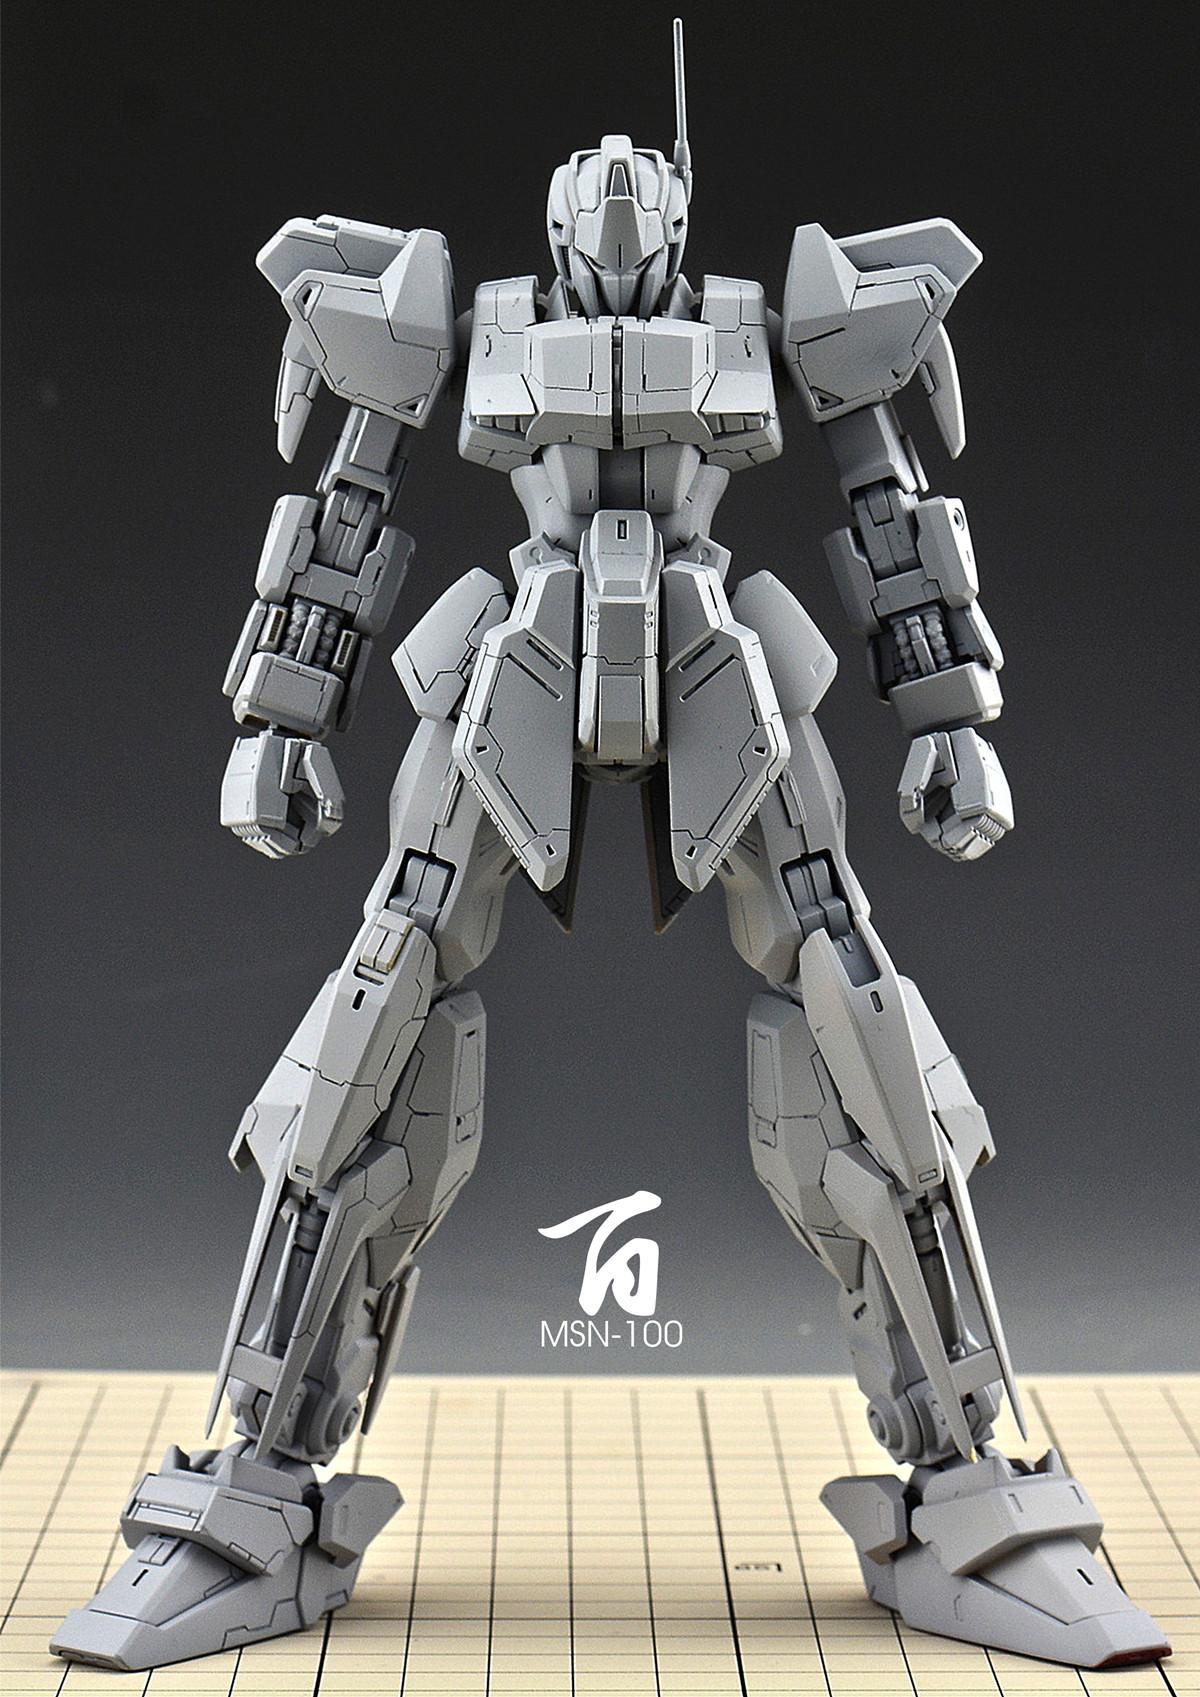 G120_hyakusiki_info_021.jpg